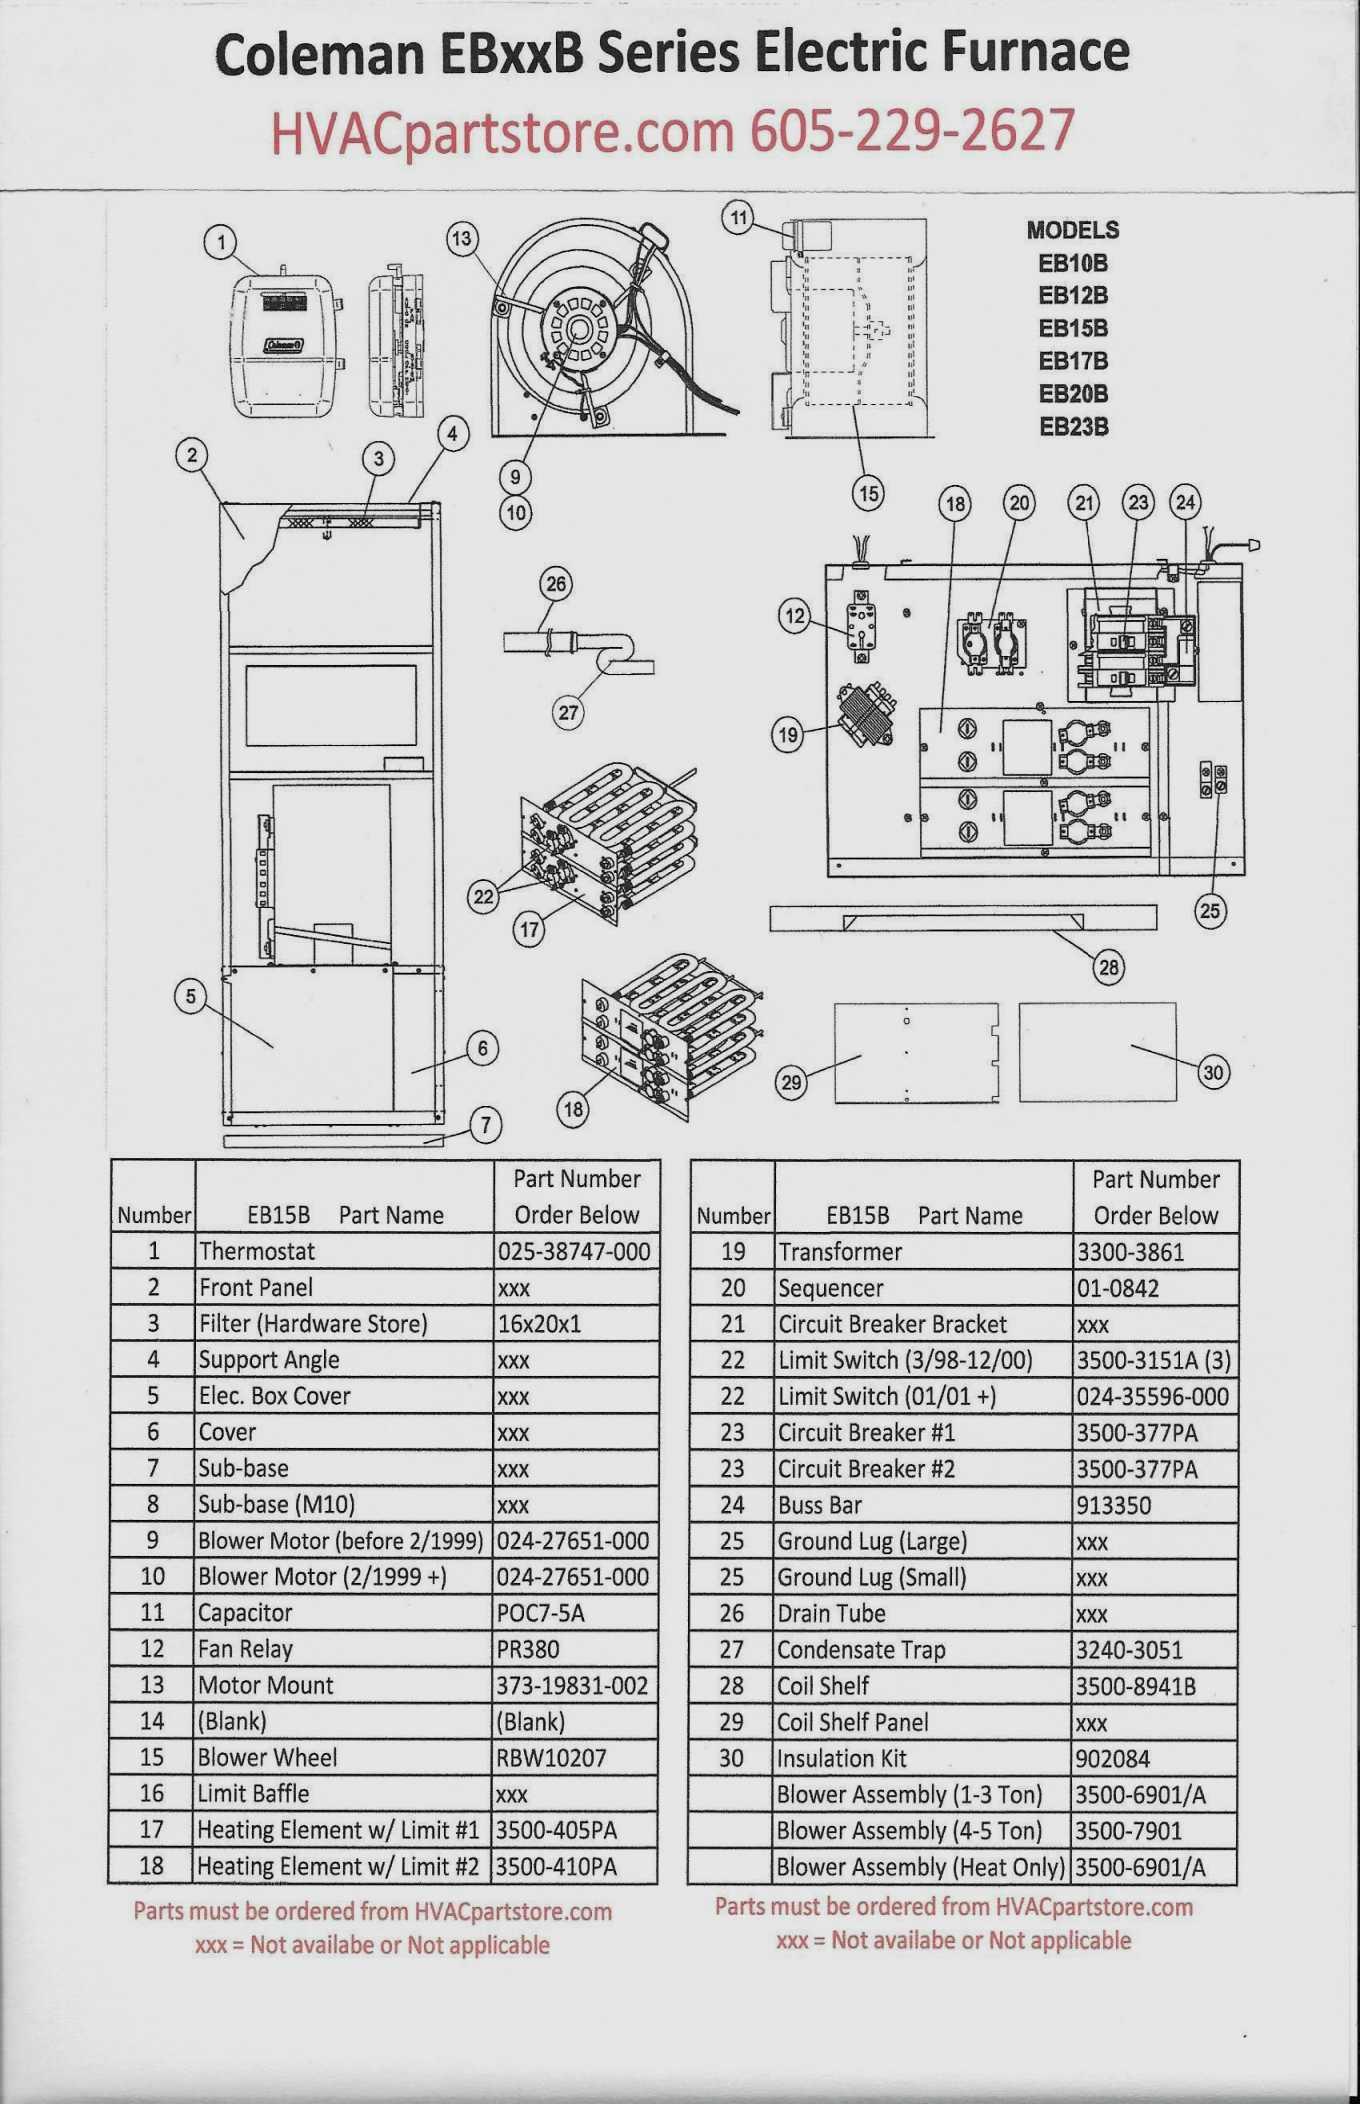 Goodman Electric Furnace Sequencer Wiring Diagram | Wiring Diagram - Electric Furnace Sequencer Wiring Diagram